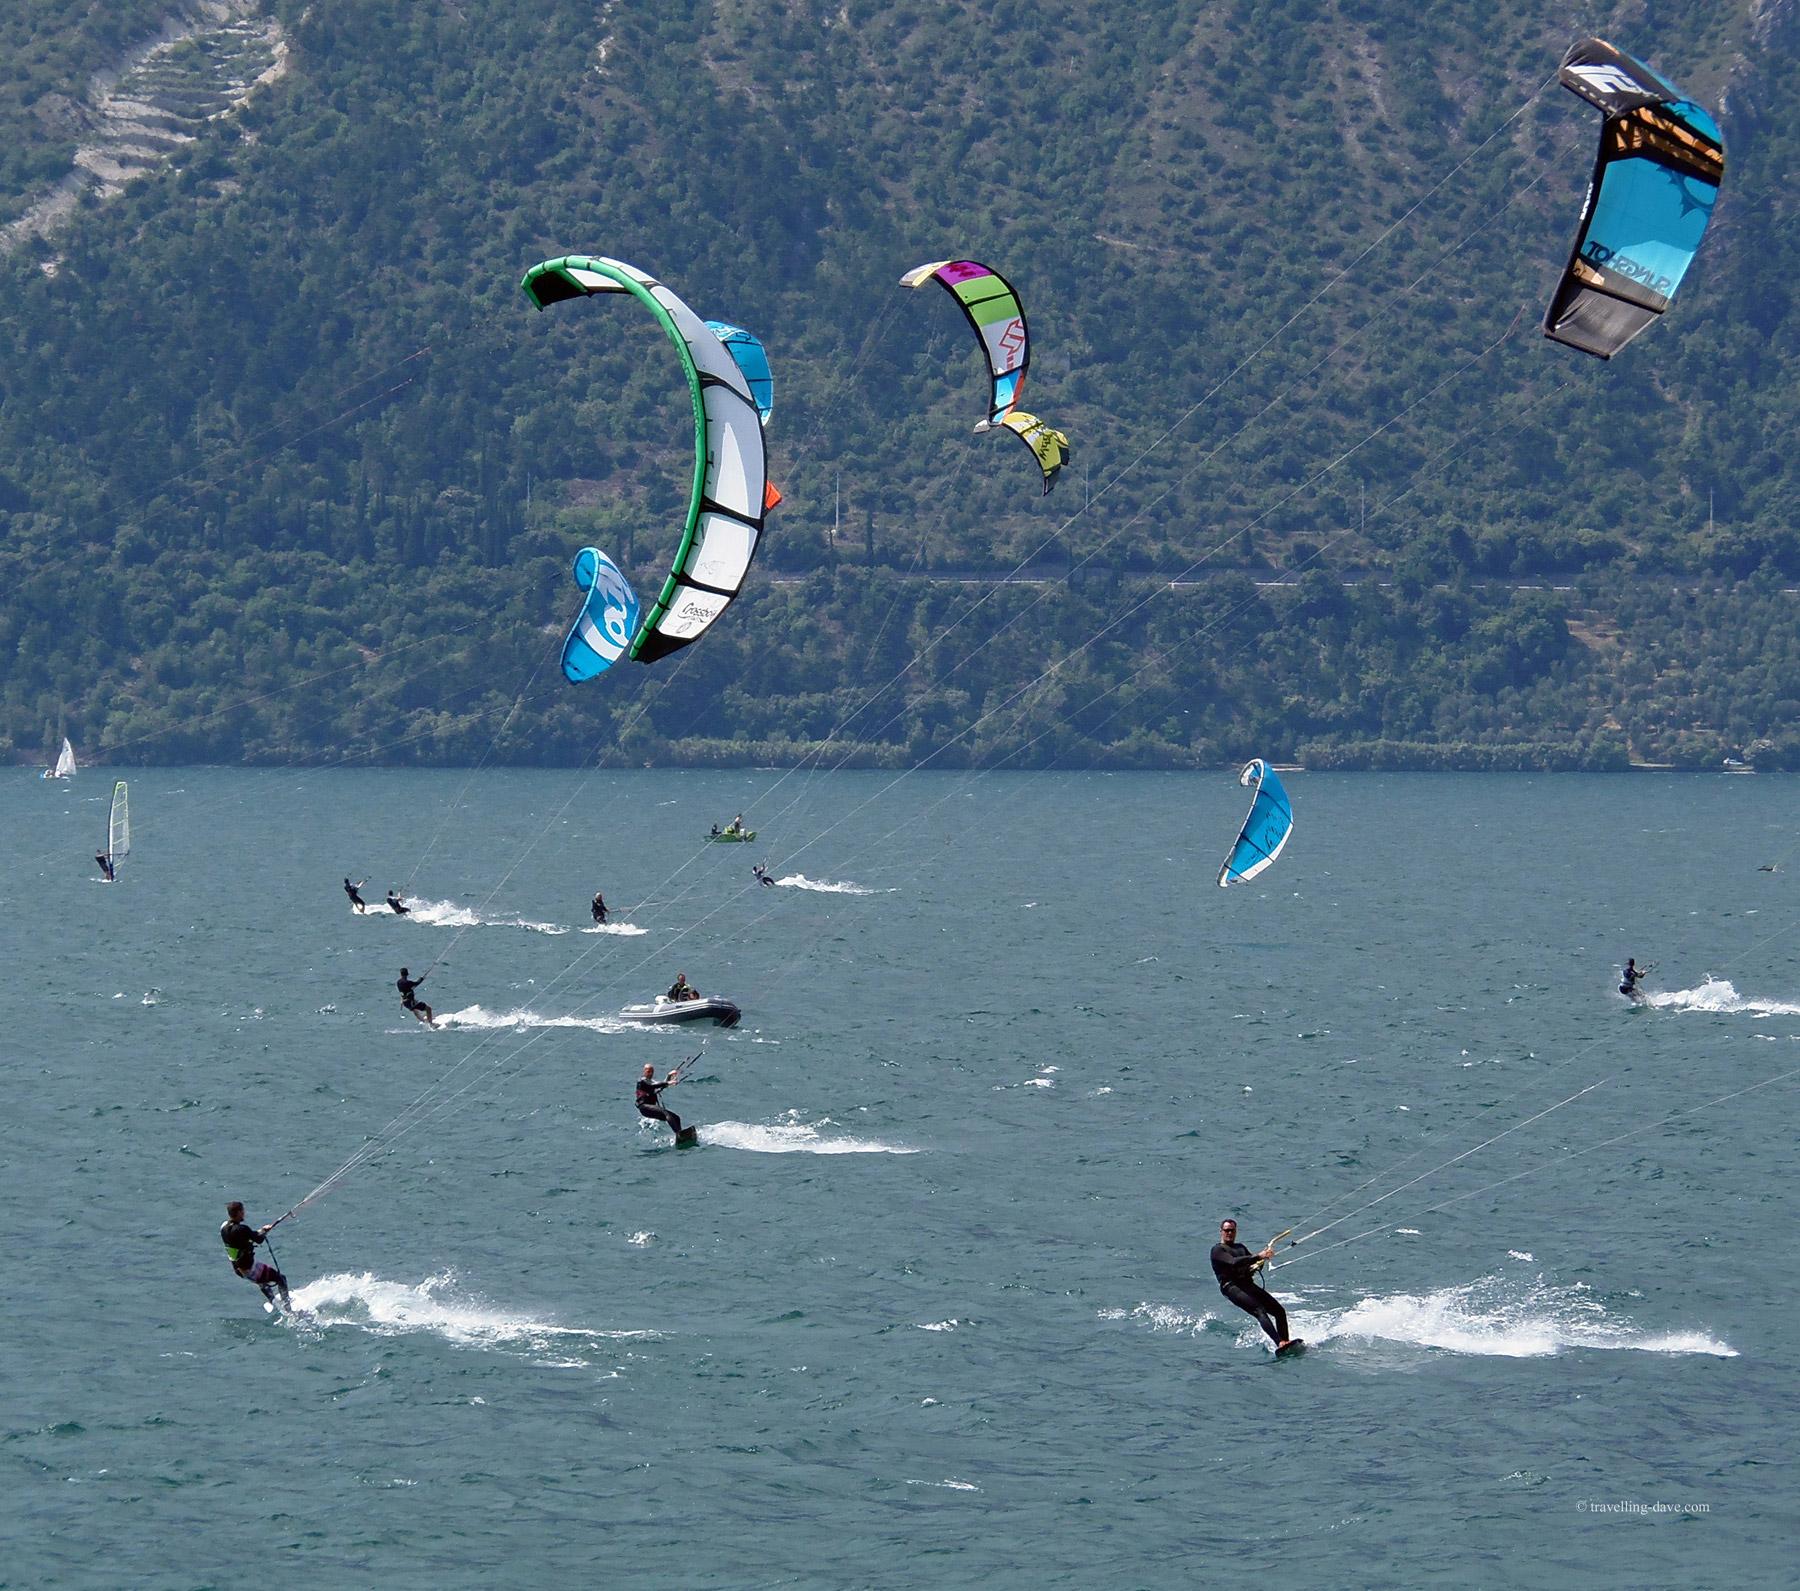 Kitesurfers on the lake in Italy